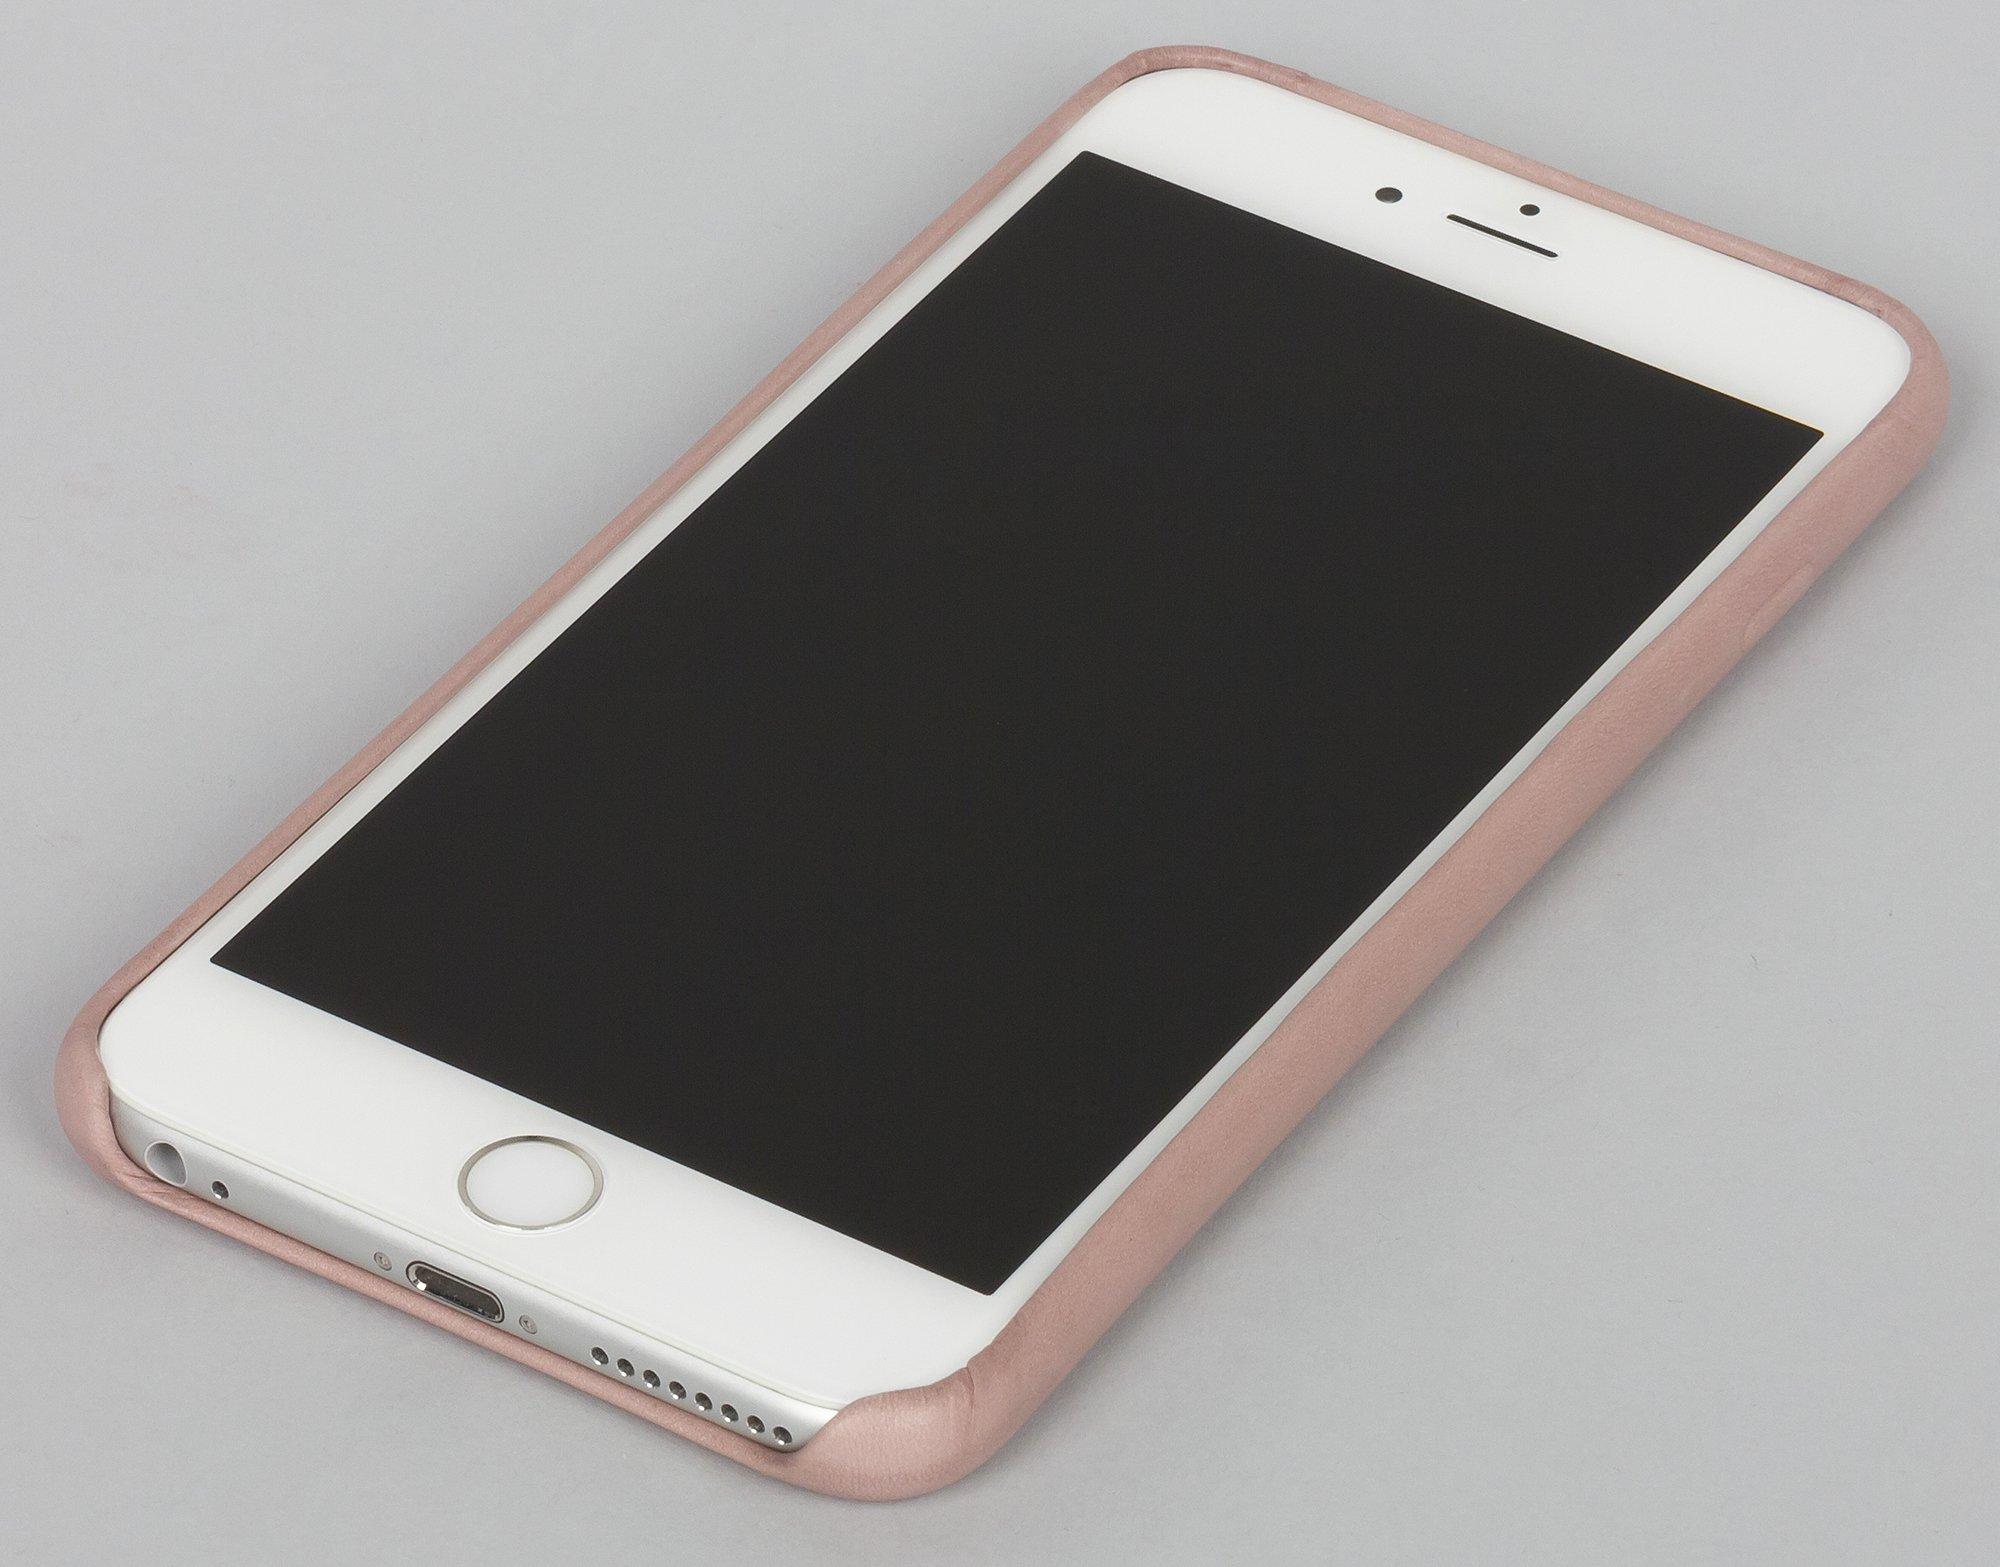 iphone 5s перенести фото на компьютер